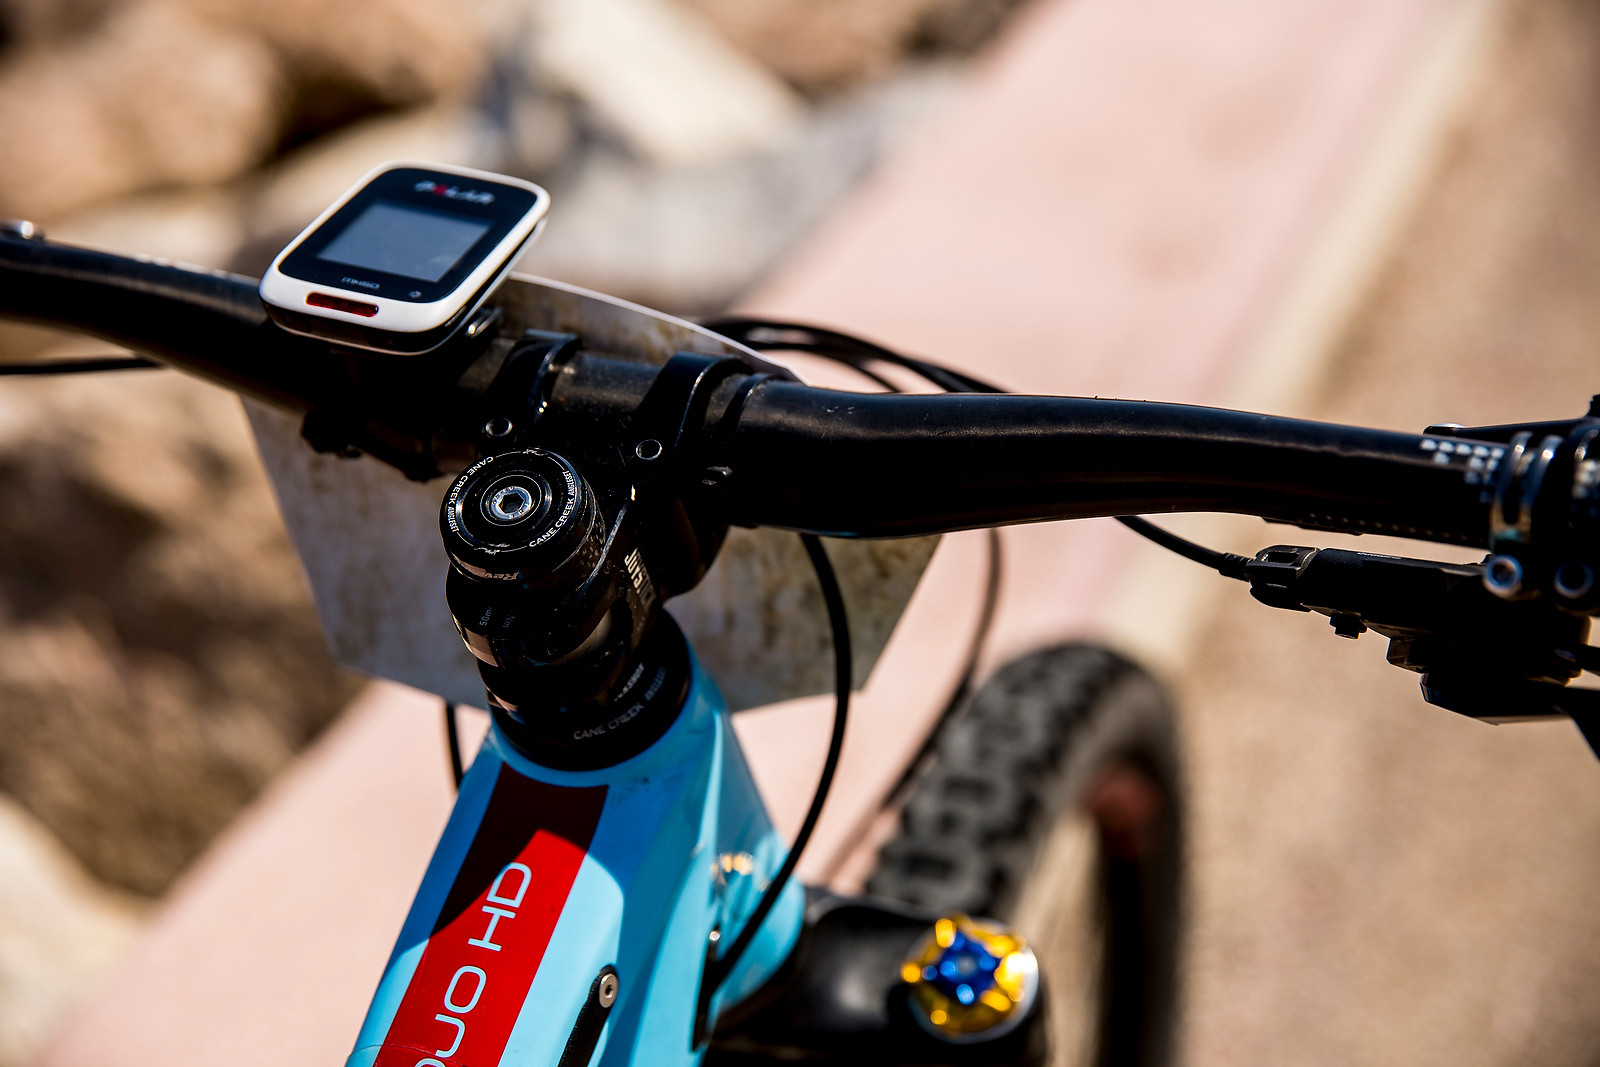 Joystick Cockpit, Cane Creek Headset - WINNING BIKE: Anita Gehrig's Ibis Mojo HD3 - Mountain Biking Pictures - Vital MTB